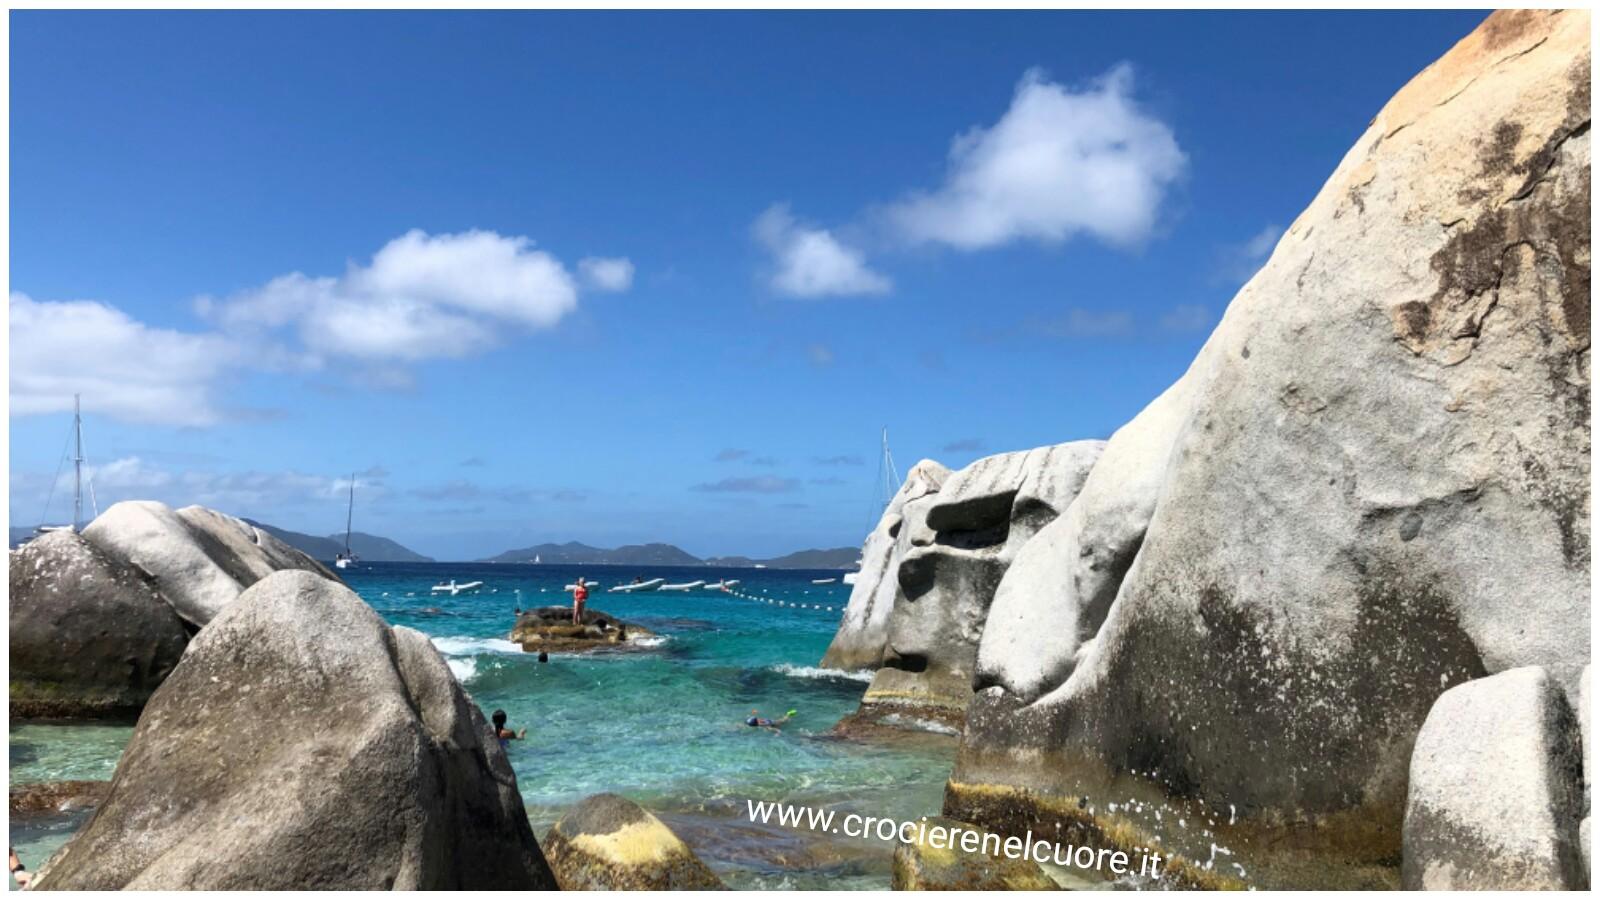 crociere nel cuore - Virgin Gorda - Tortola